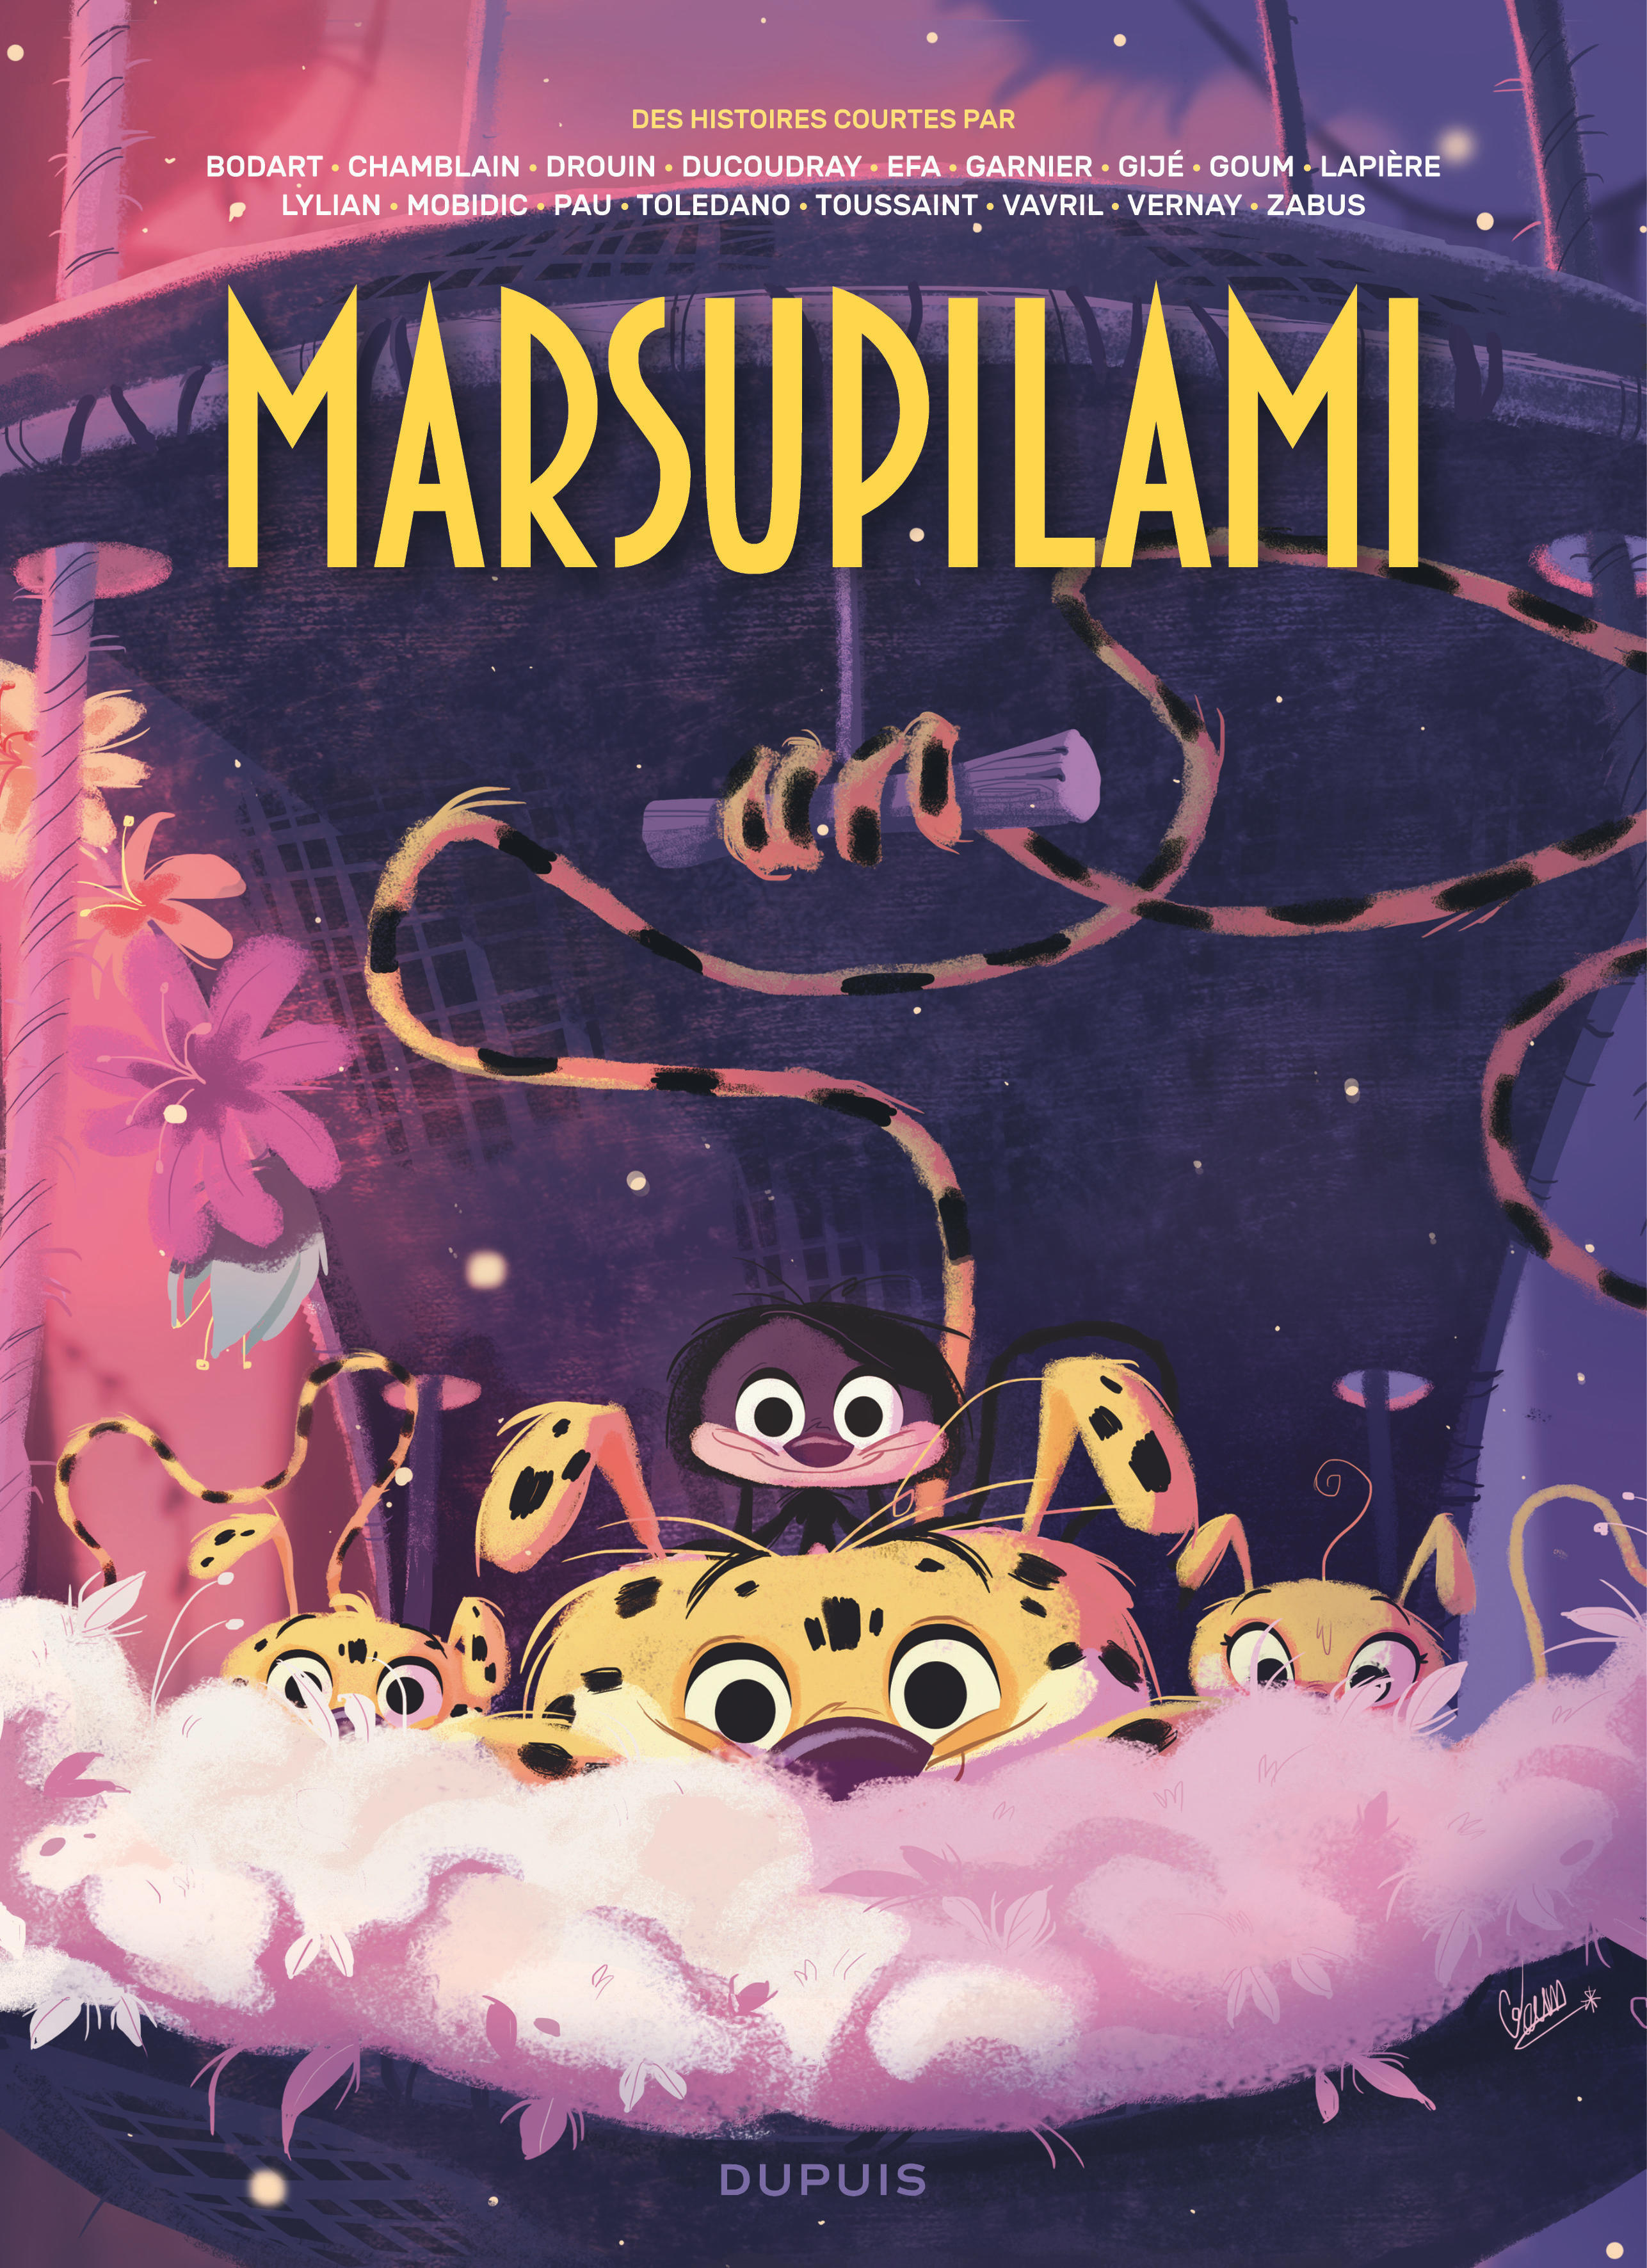 MARSUPILAMI PAR T2 MARSUPILAMI PAR - TOME 2 - DES HISTOIRES COURTES DU MARSUPILAMI PAR...TOME 2